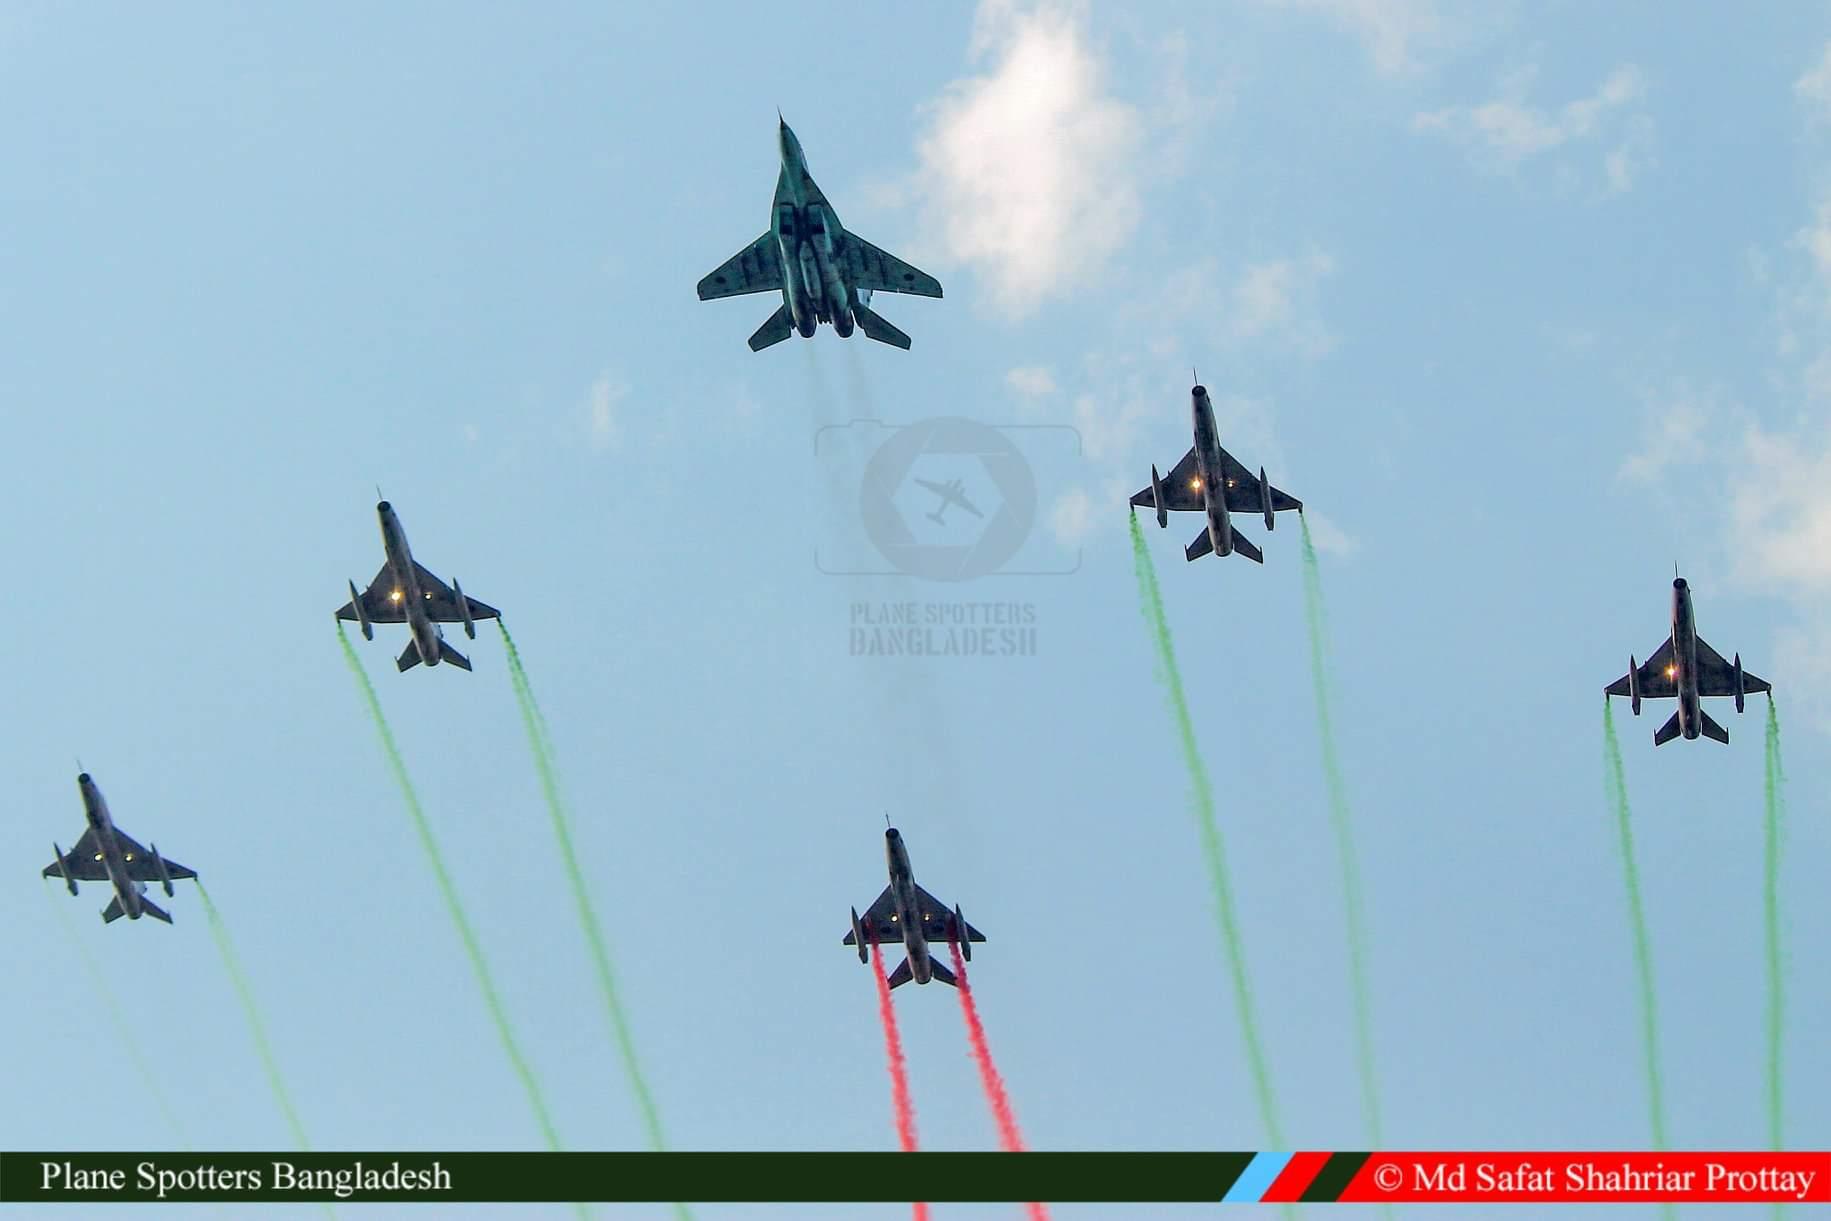 Photos - Bangladesh Military Photos   Page 14